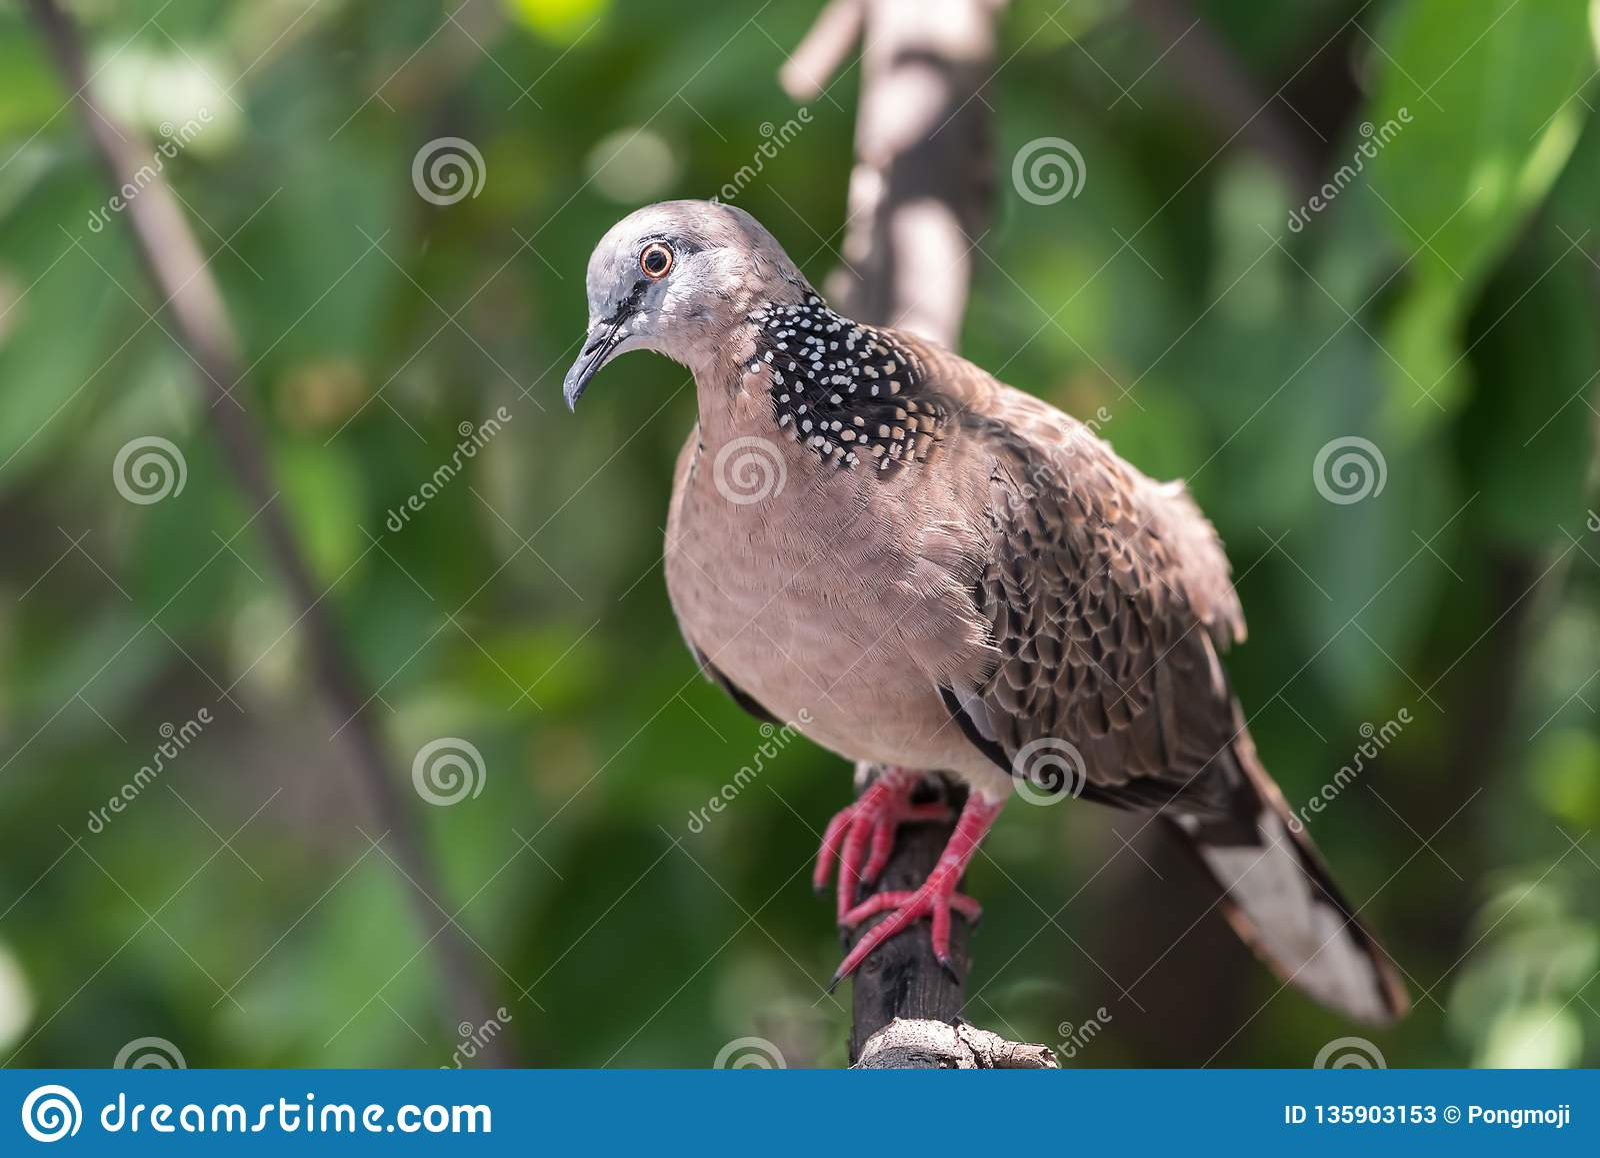 Pájaro (paloma, paloma o desambiguación) en una naturaleza